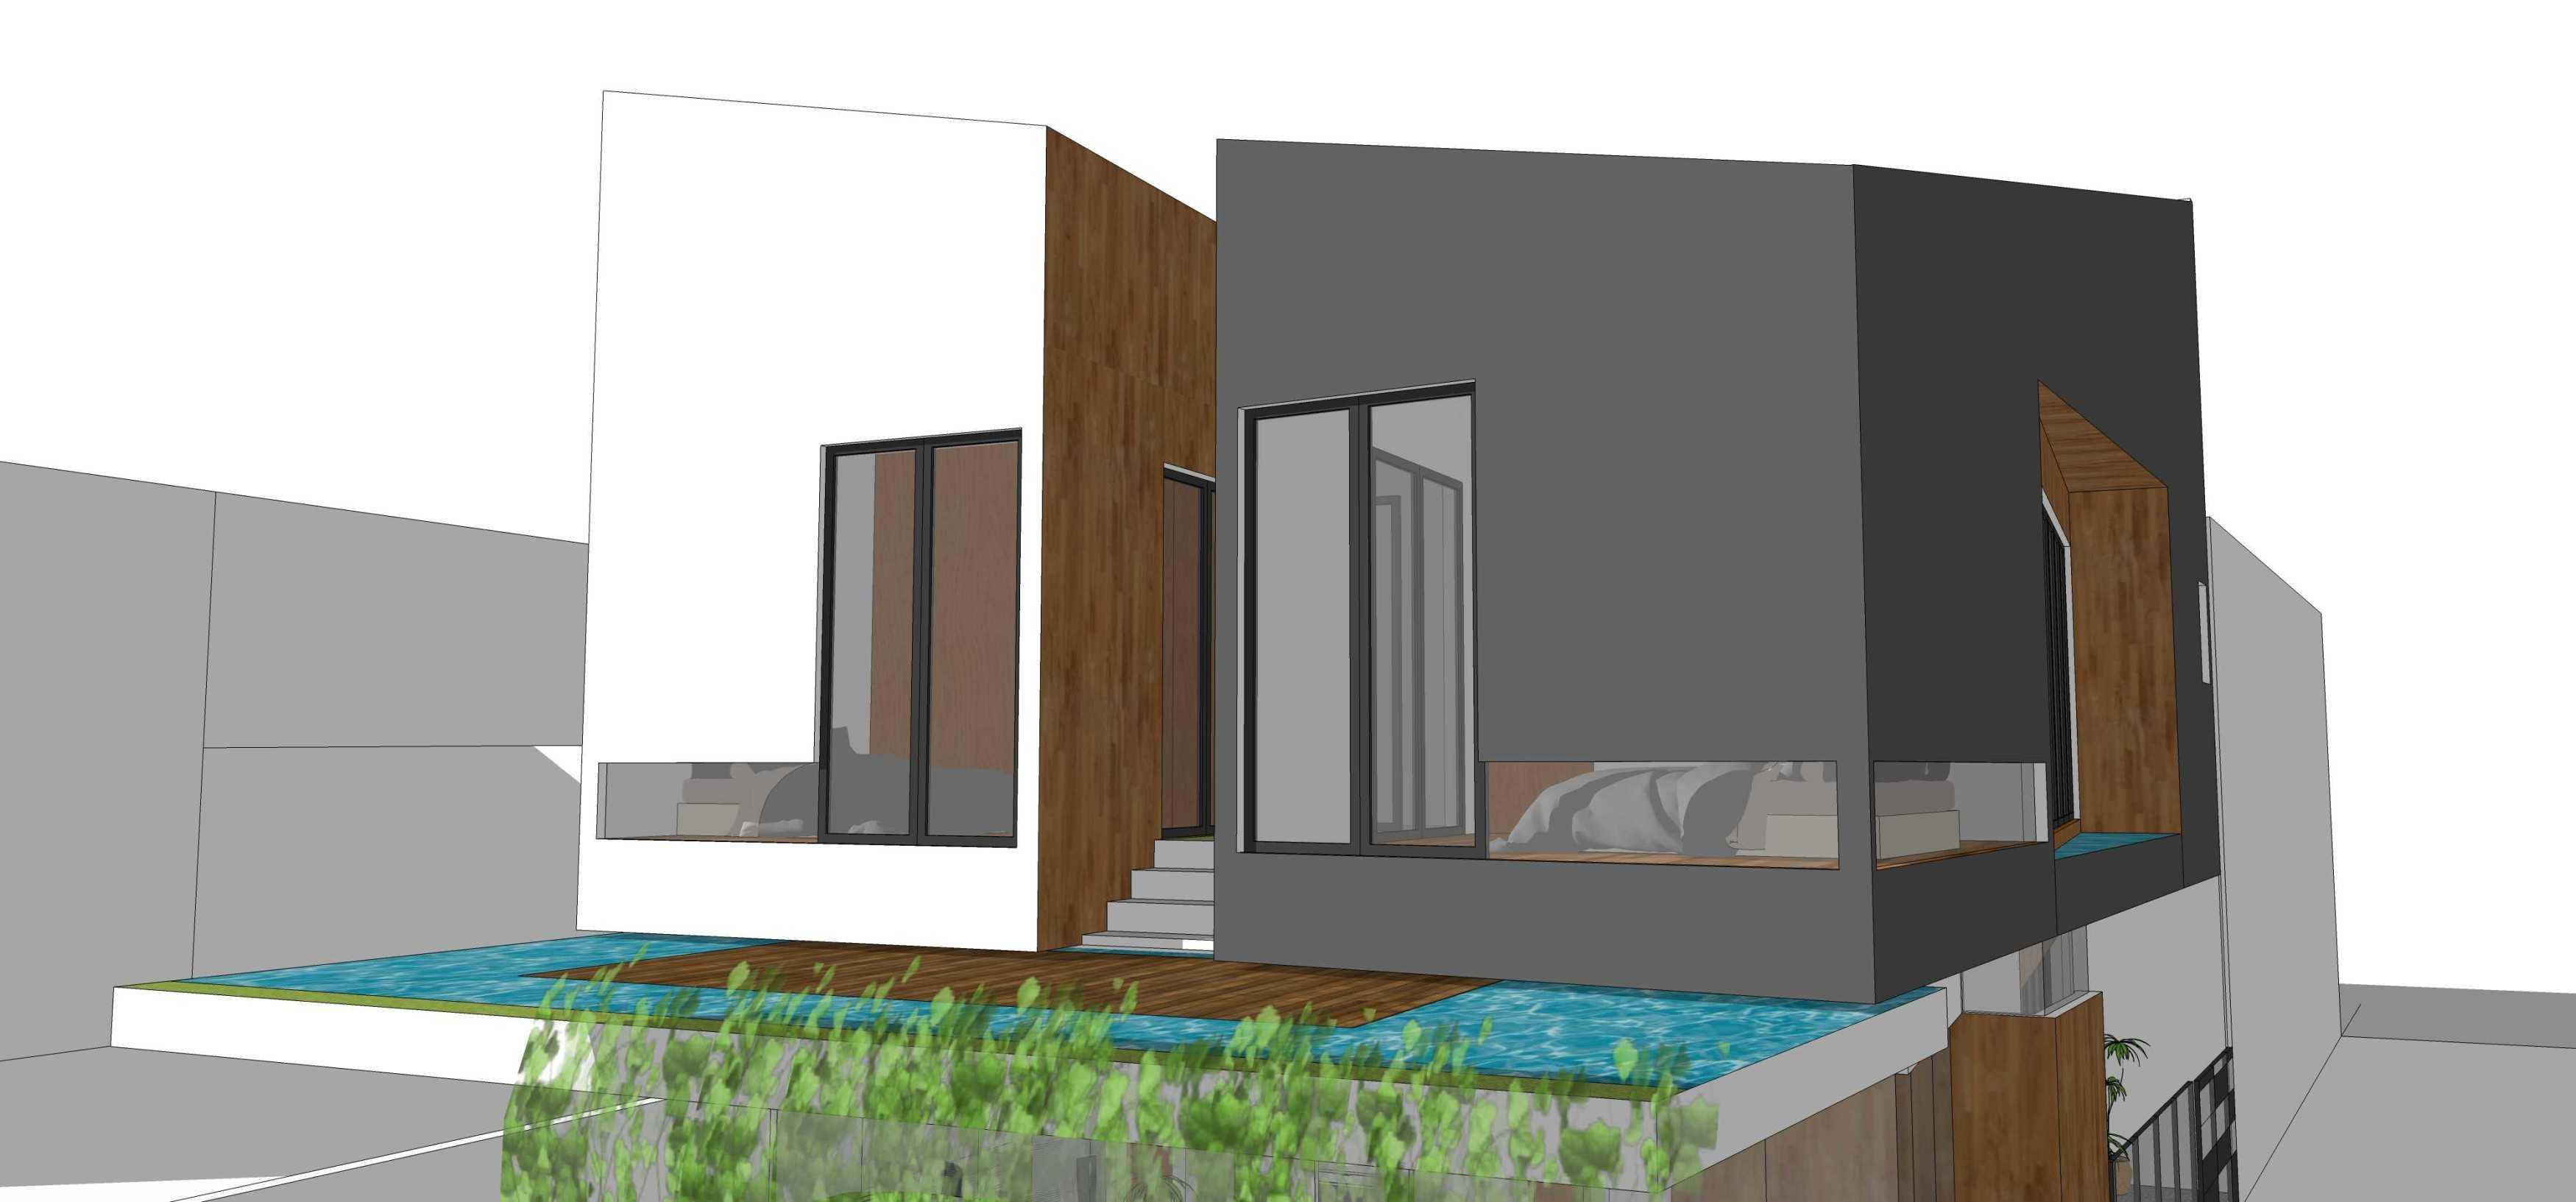 Dmnt Architects Mutiara House Bekasi, West Java, Indonesia Bekasi, West Java, Indonesia 2Nd Floor Facade   29017